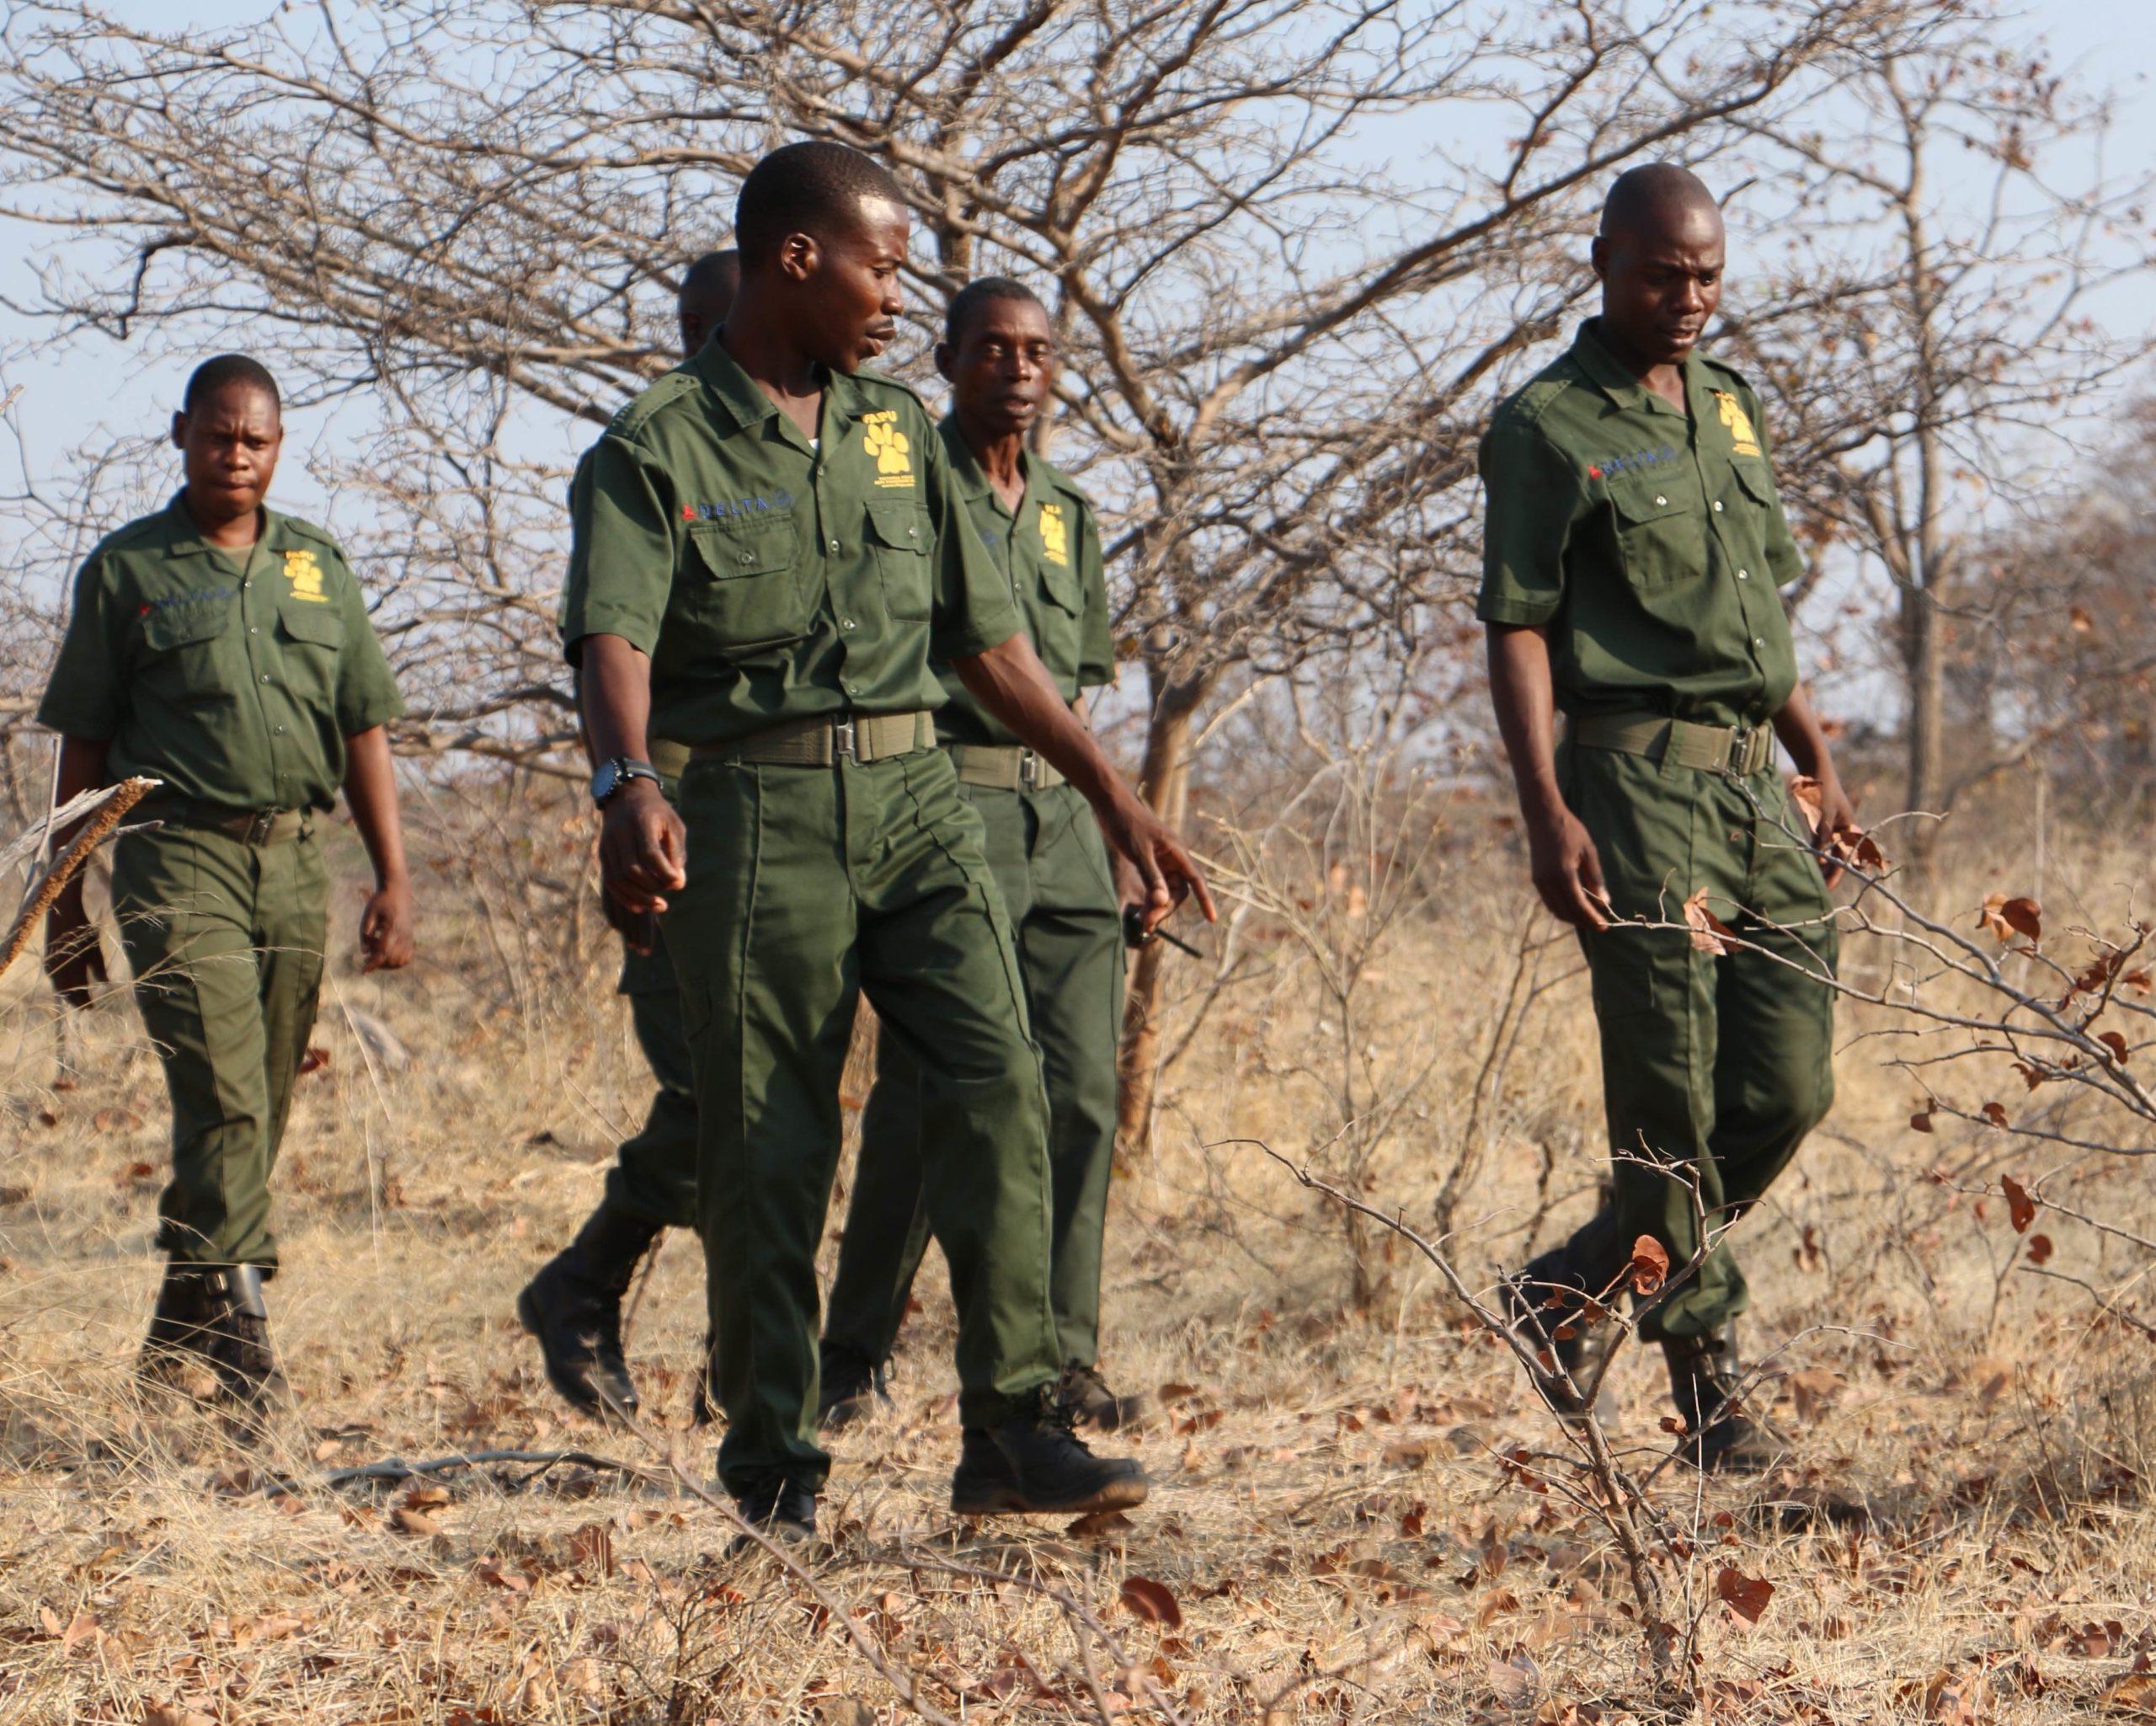 Africa Albida Tourism Zimbabwean Ambassadors in Conservation Fundraising Drive